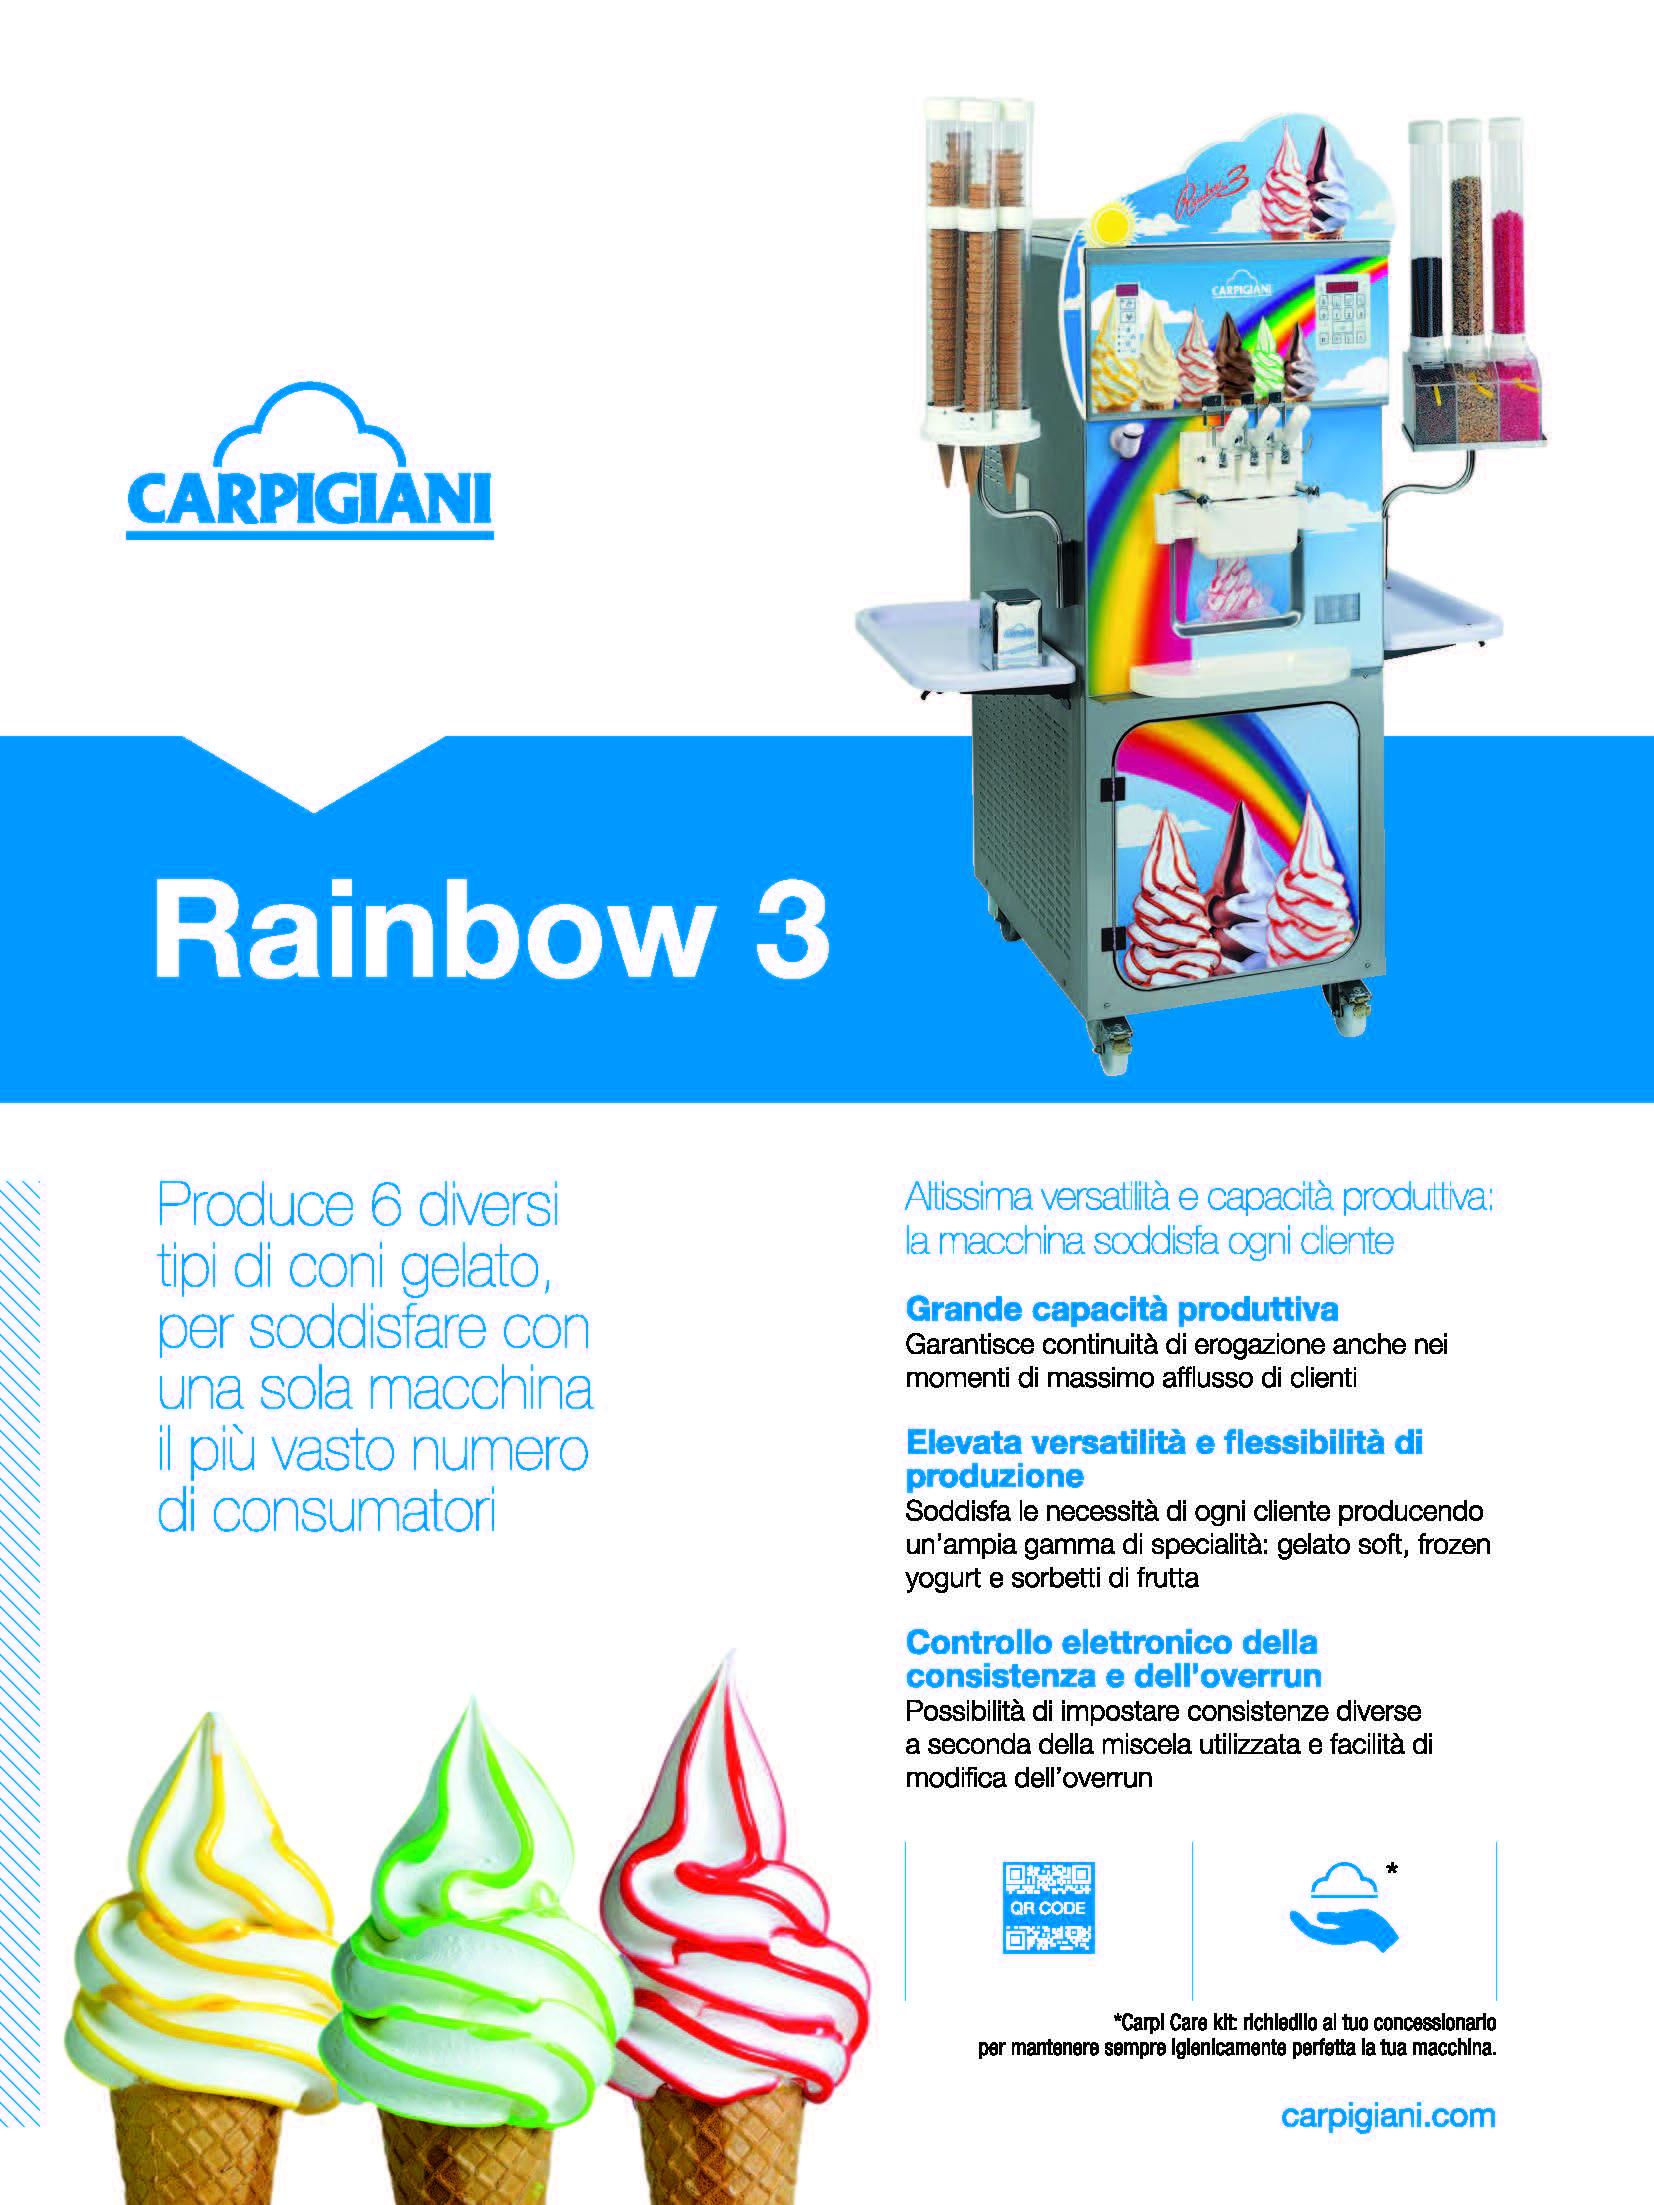 Carpigiani – Rainbow 3